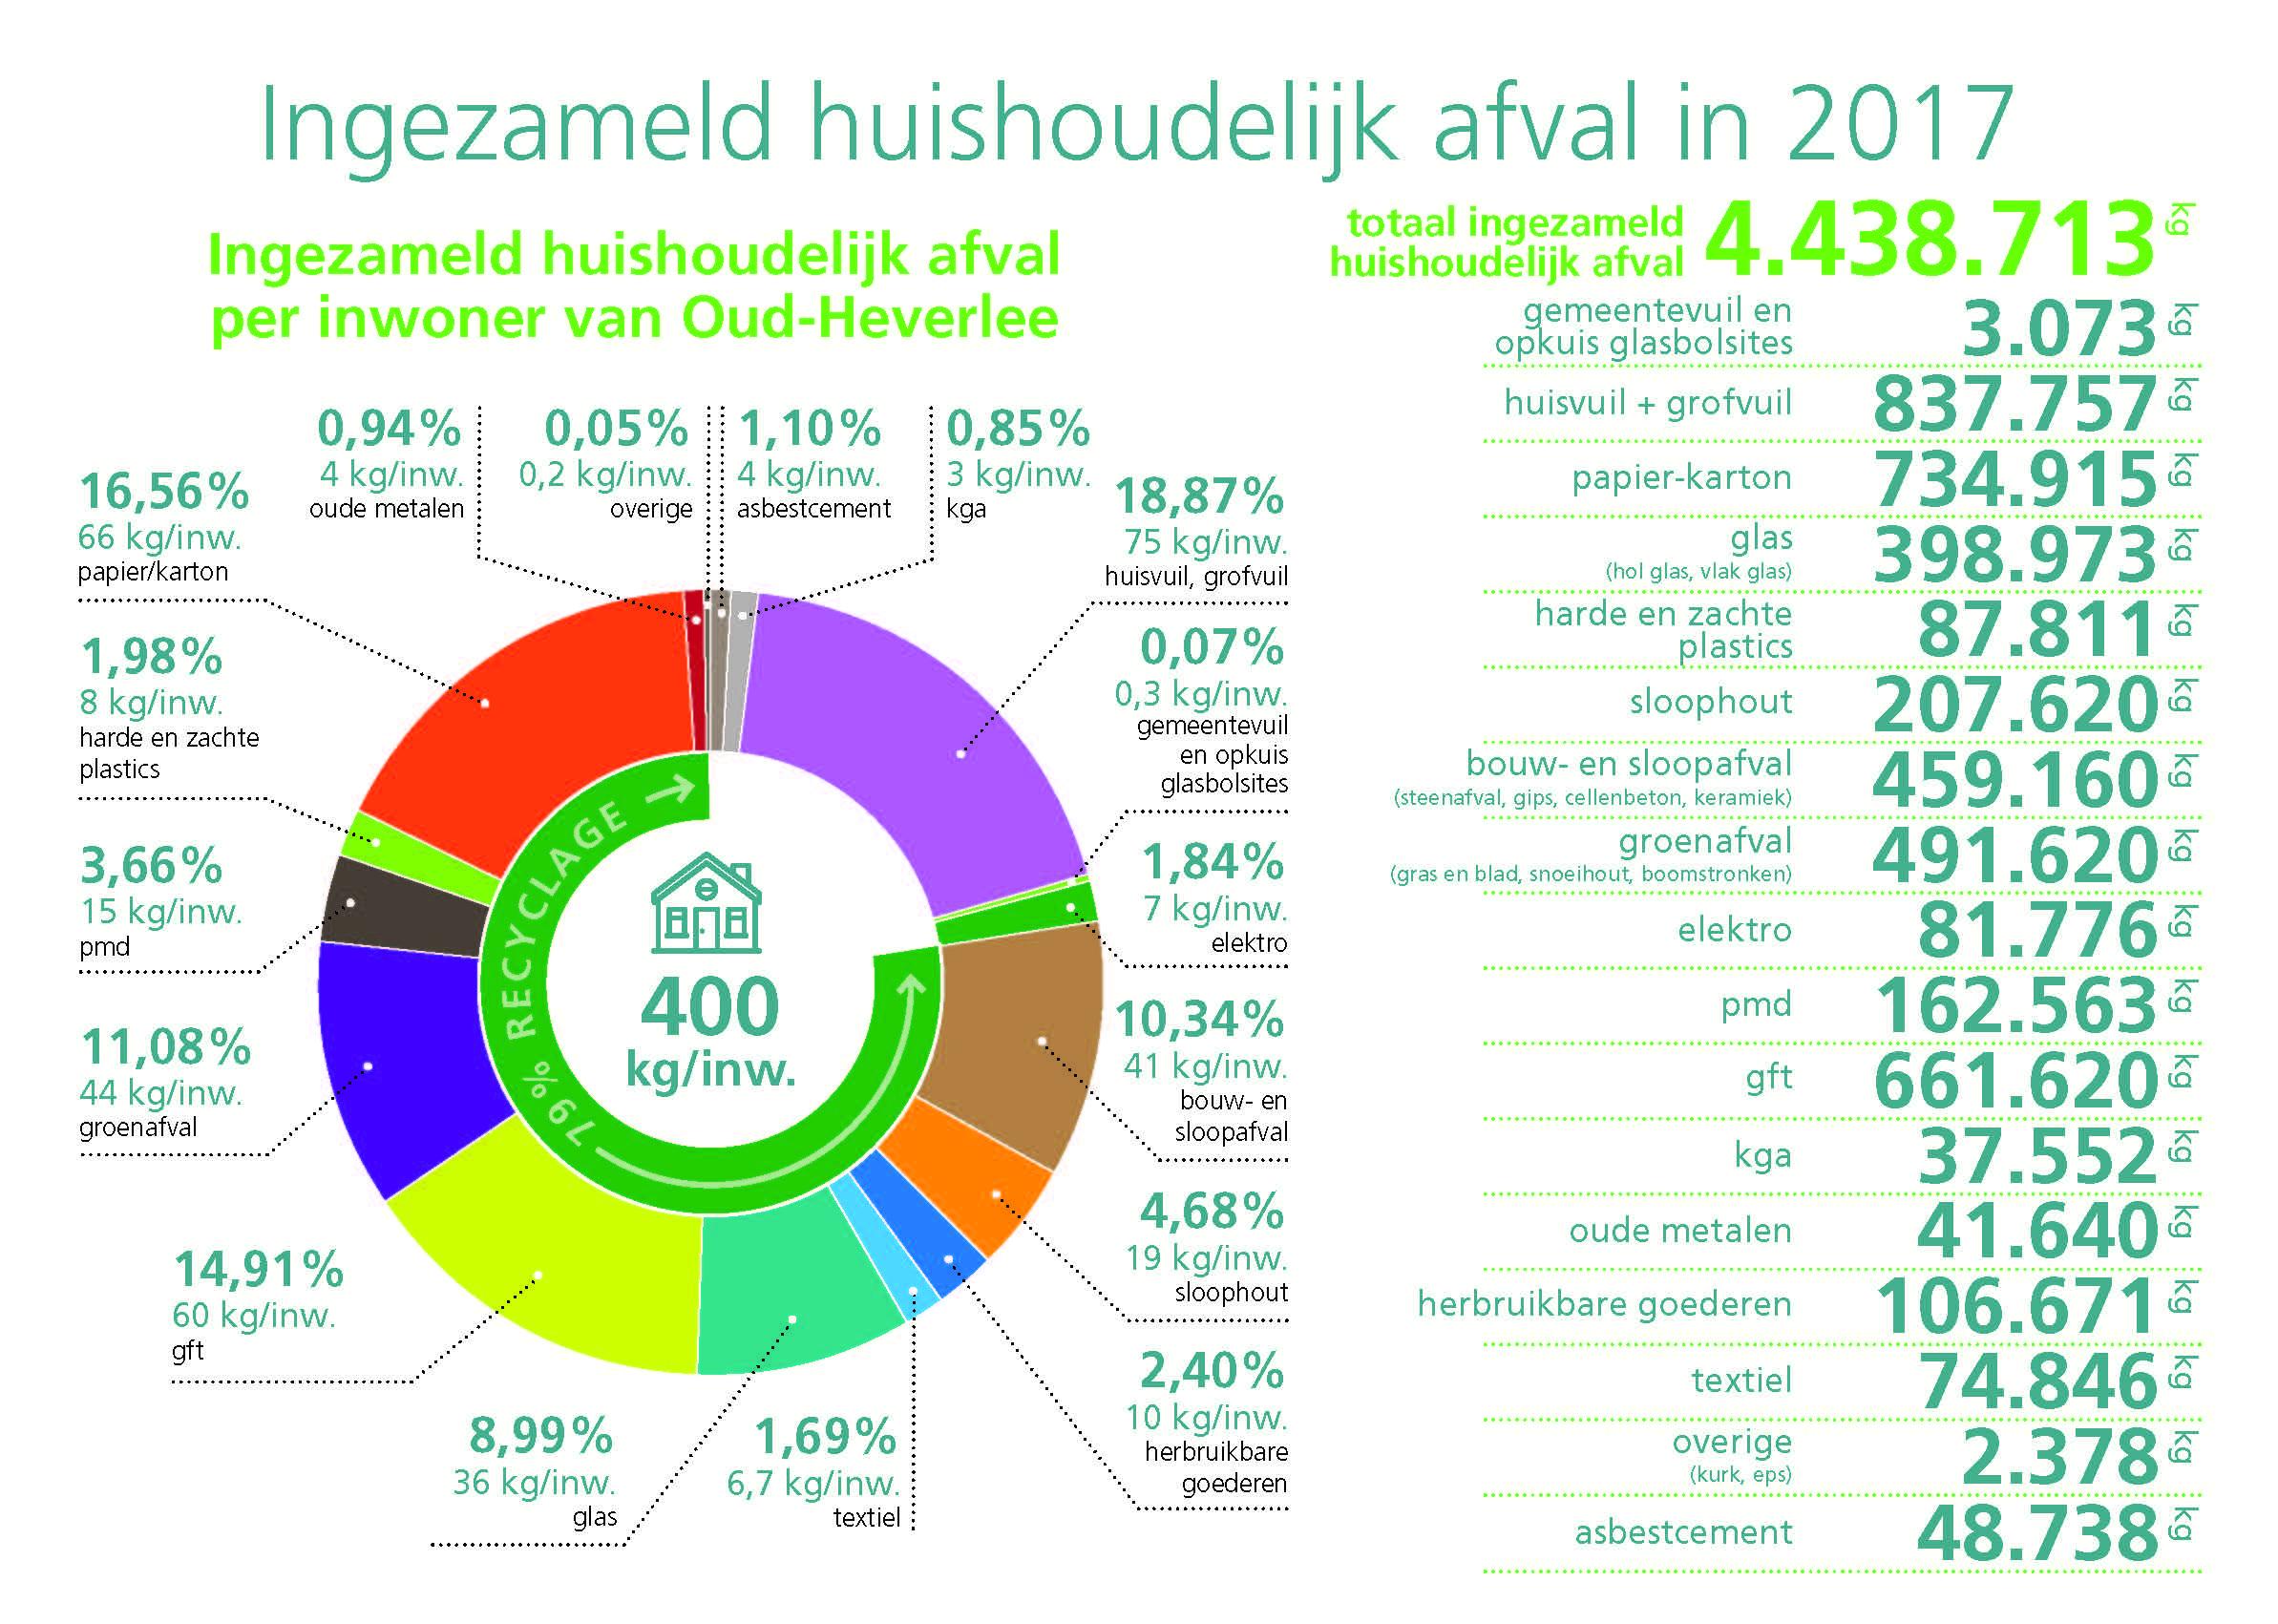 CD_2018061_huishoudelijk_afval_Oud-Heverlee_2017.jpg